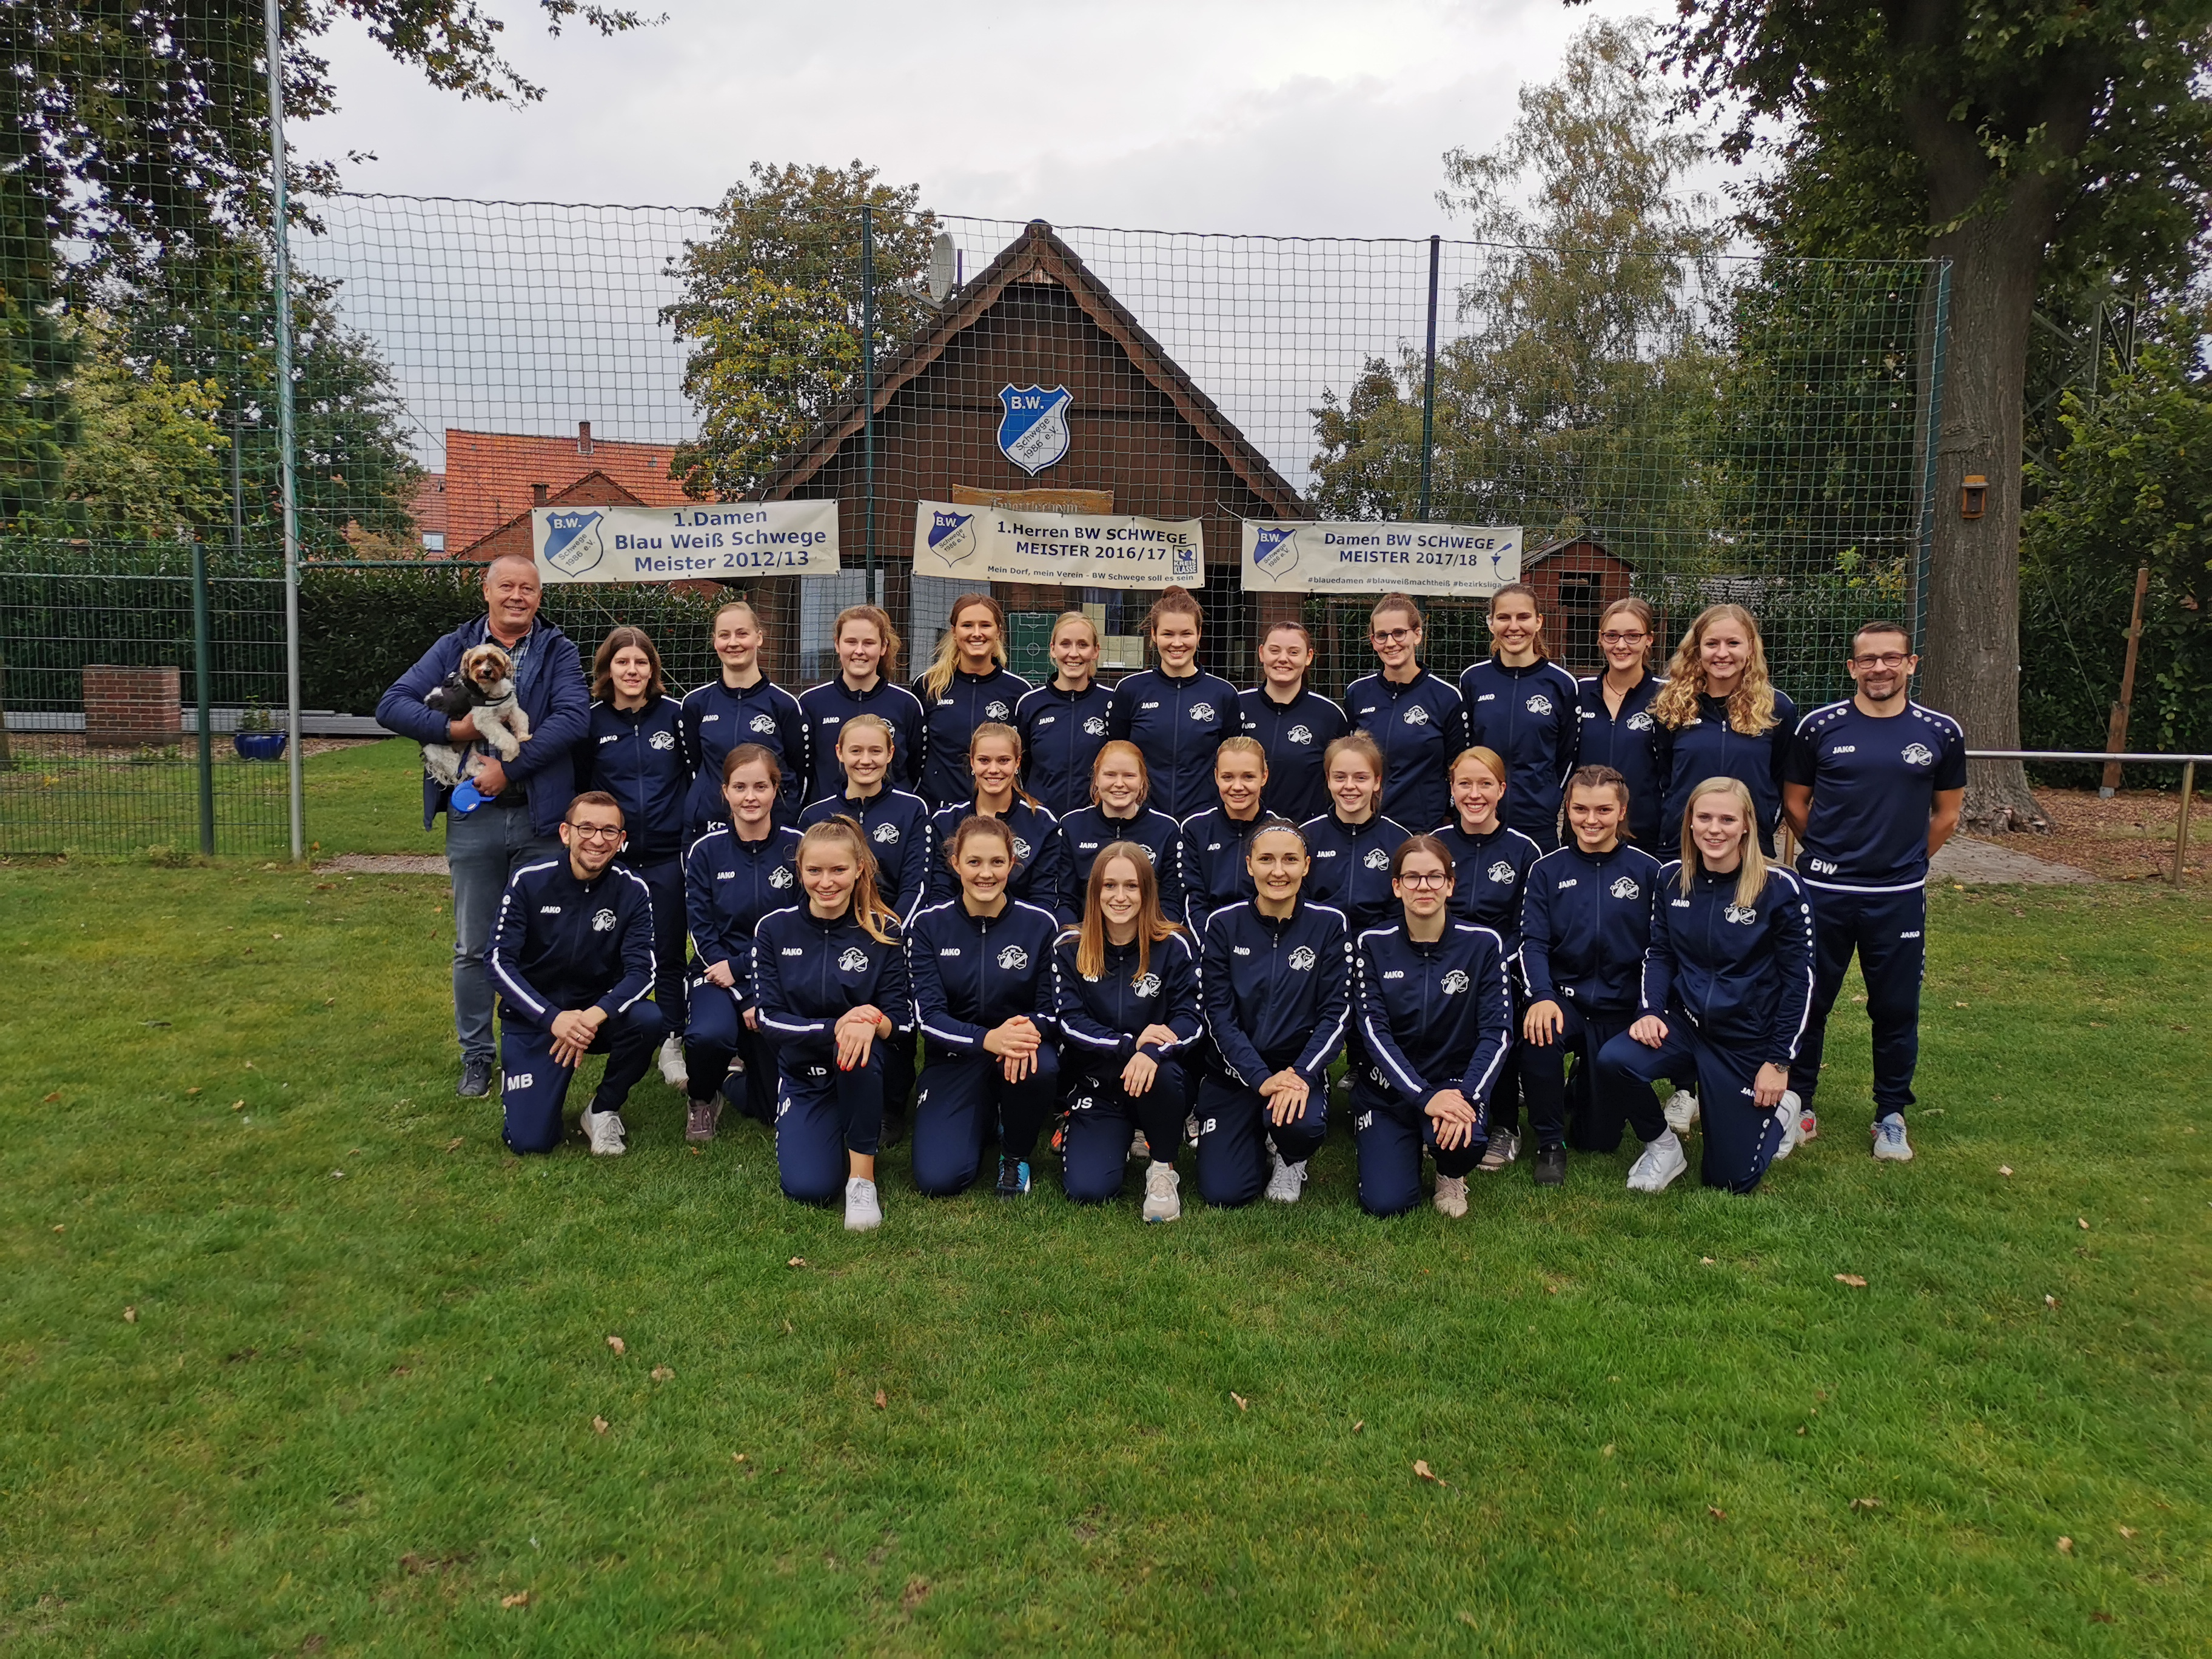 BW_Schwege_Frauenfussball_SG_Bad_Laer